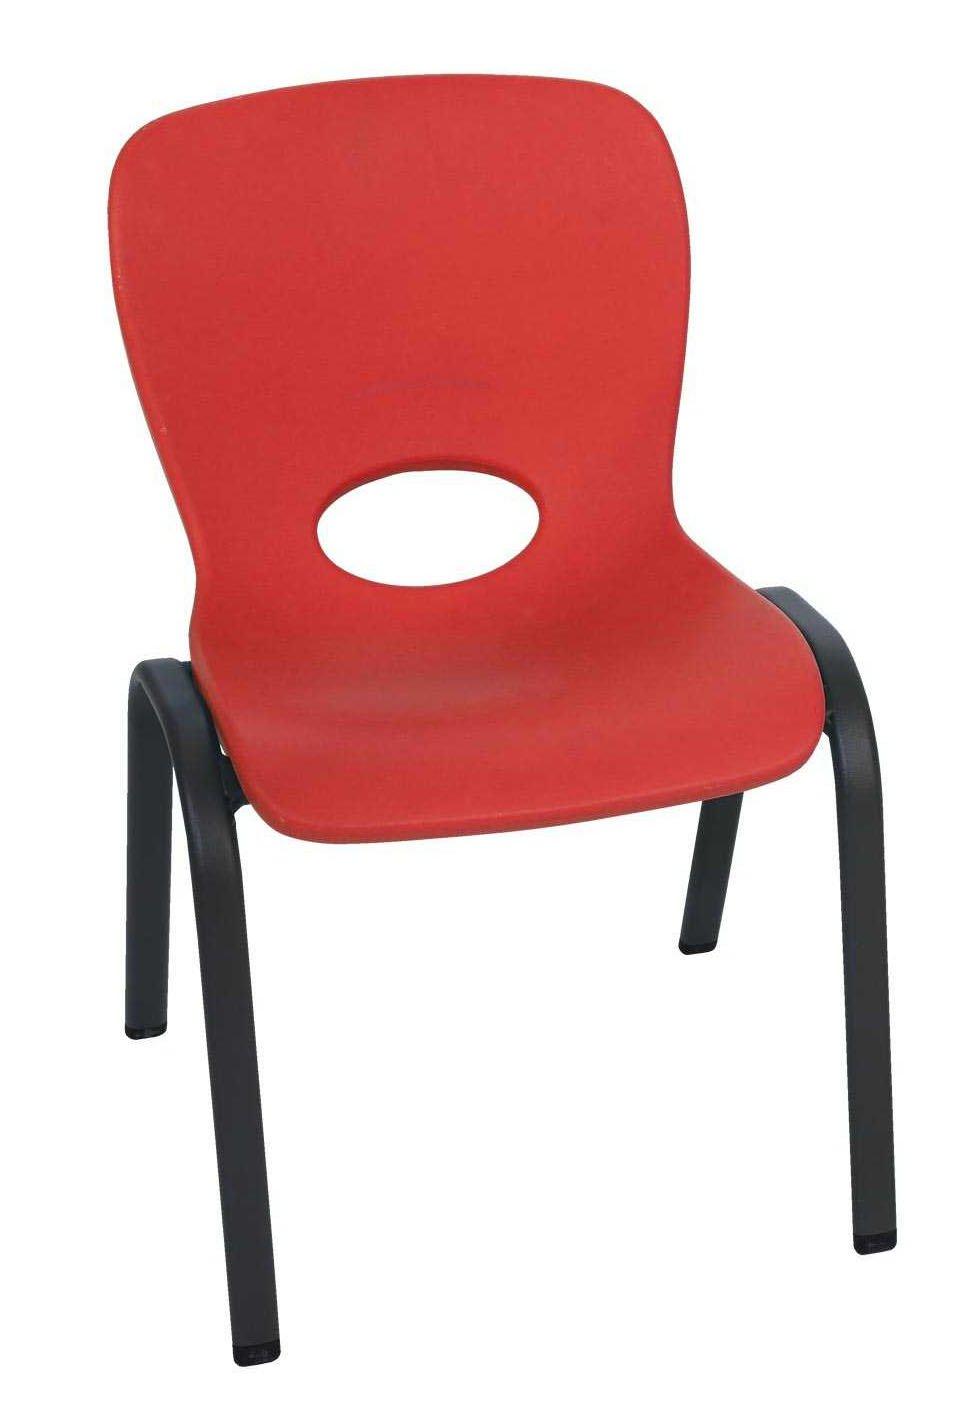 Lifetime - Silla Infantil Apilable, Rojo, LFT Kid Chair ...